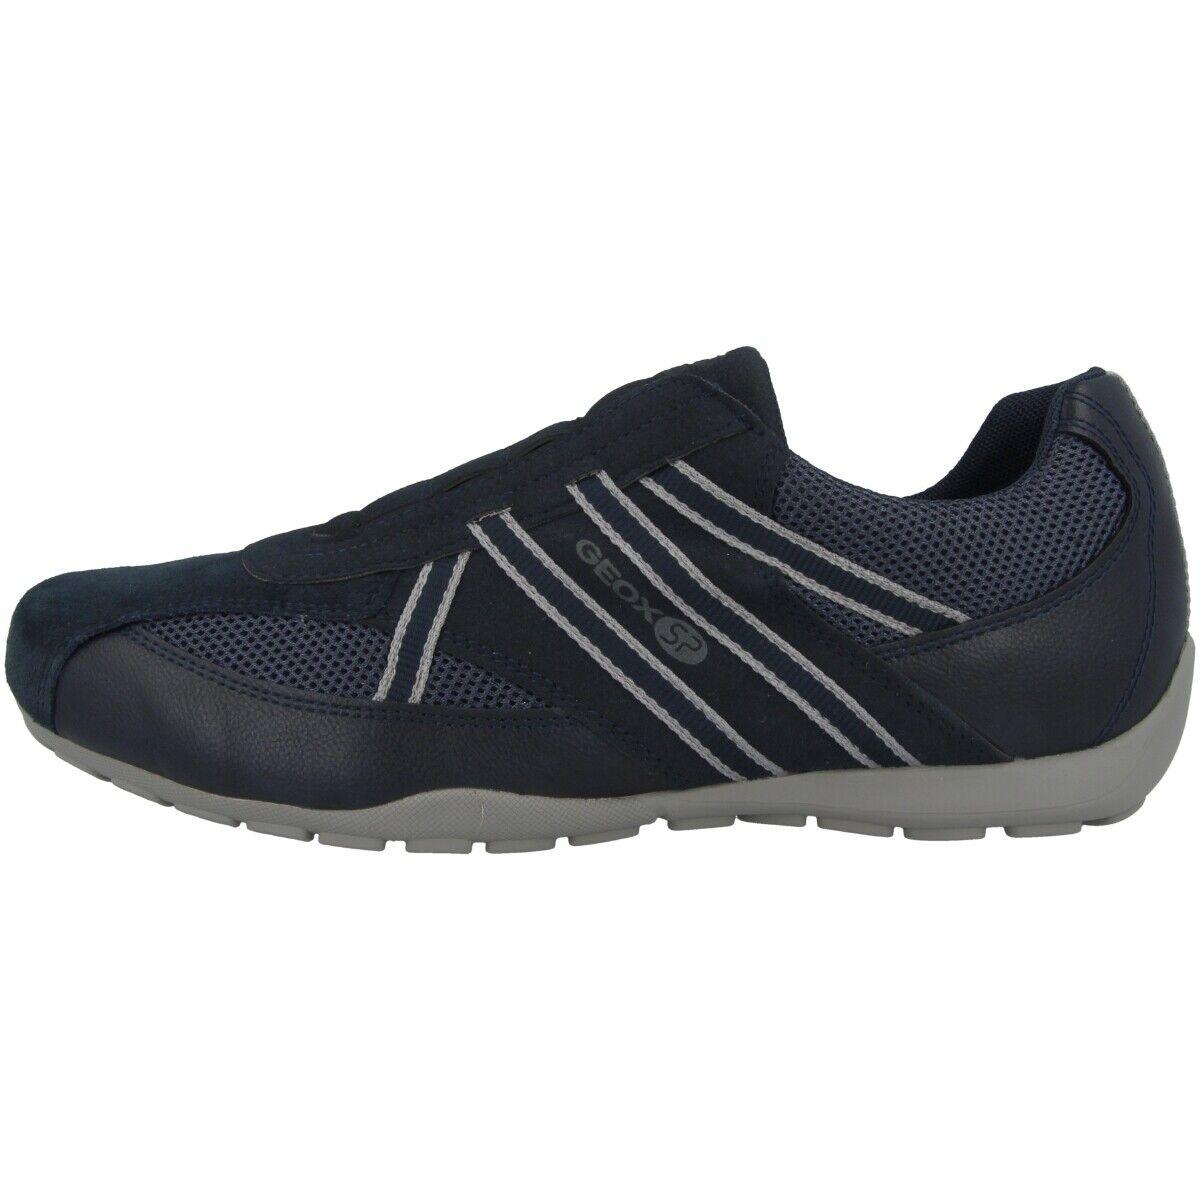 Geox U ravex C shoes Sneakers Casual Flats Navy u923fc0au14c4002